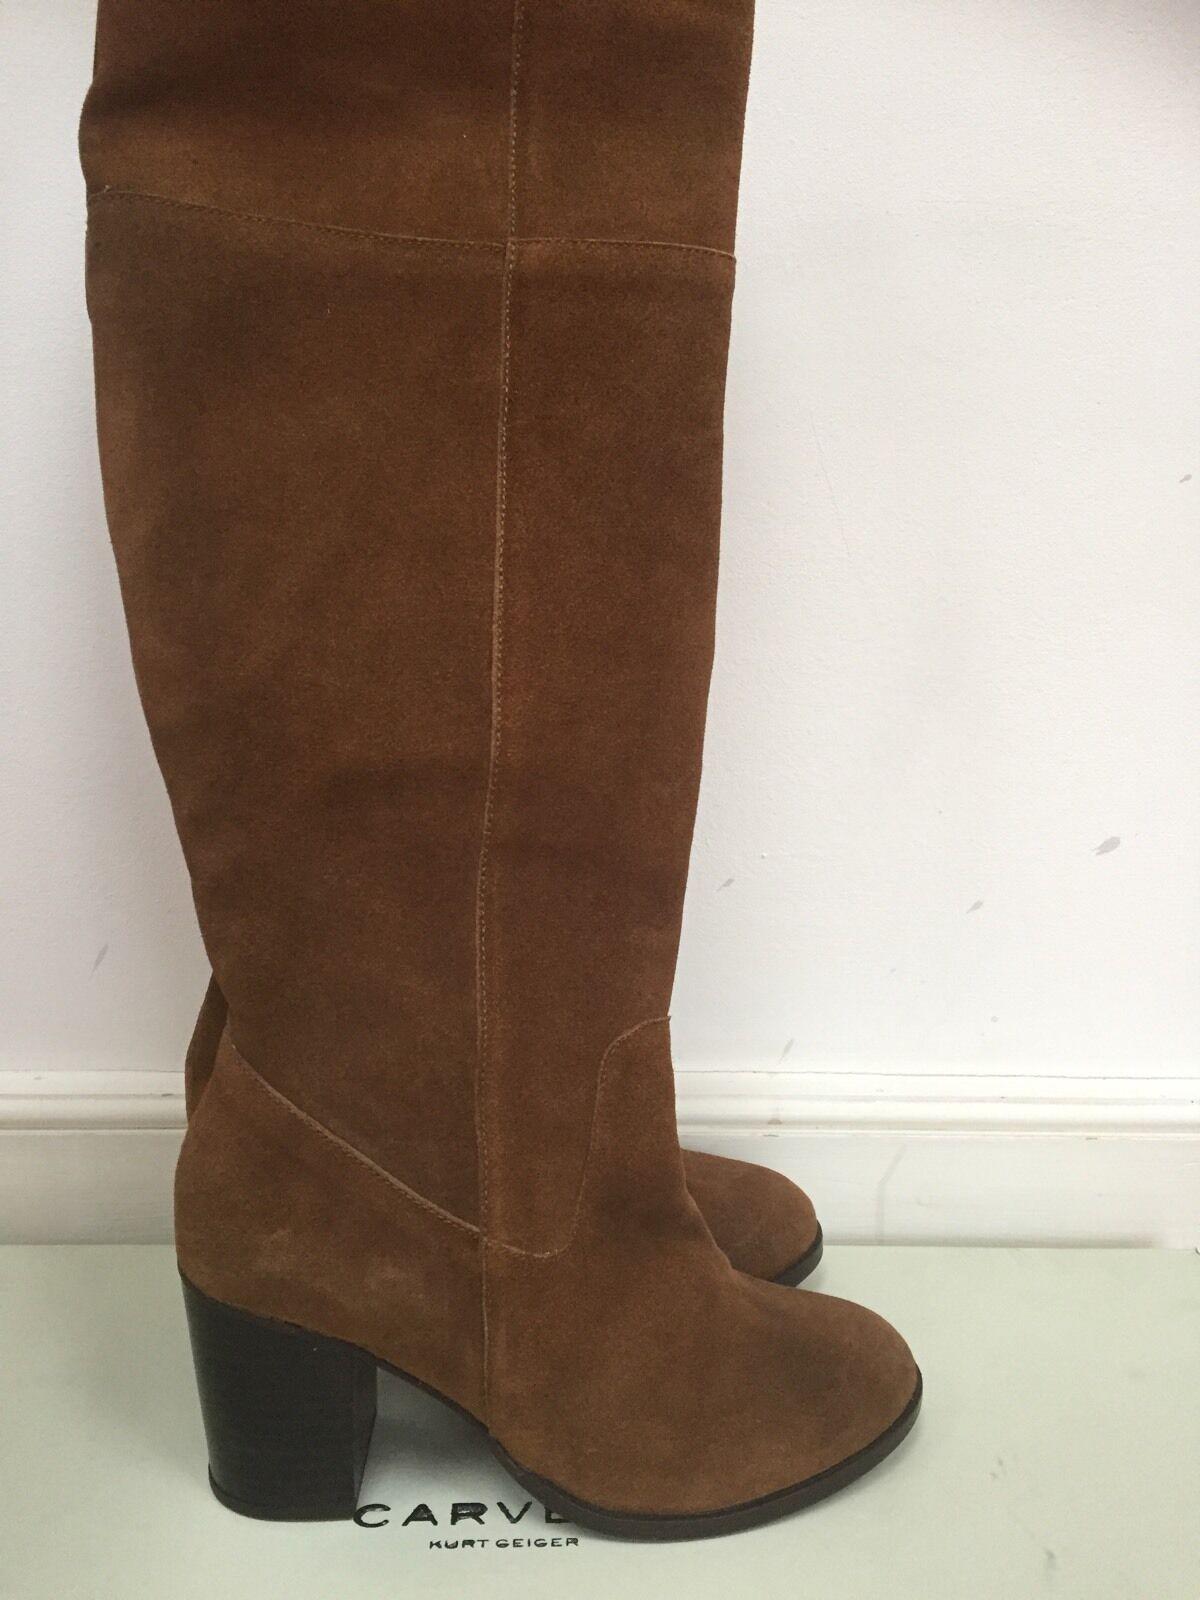 Carvela Kurt Geiger Suede Pride Stiefel  Leather schuhe UK 4 Euro 37